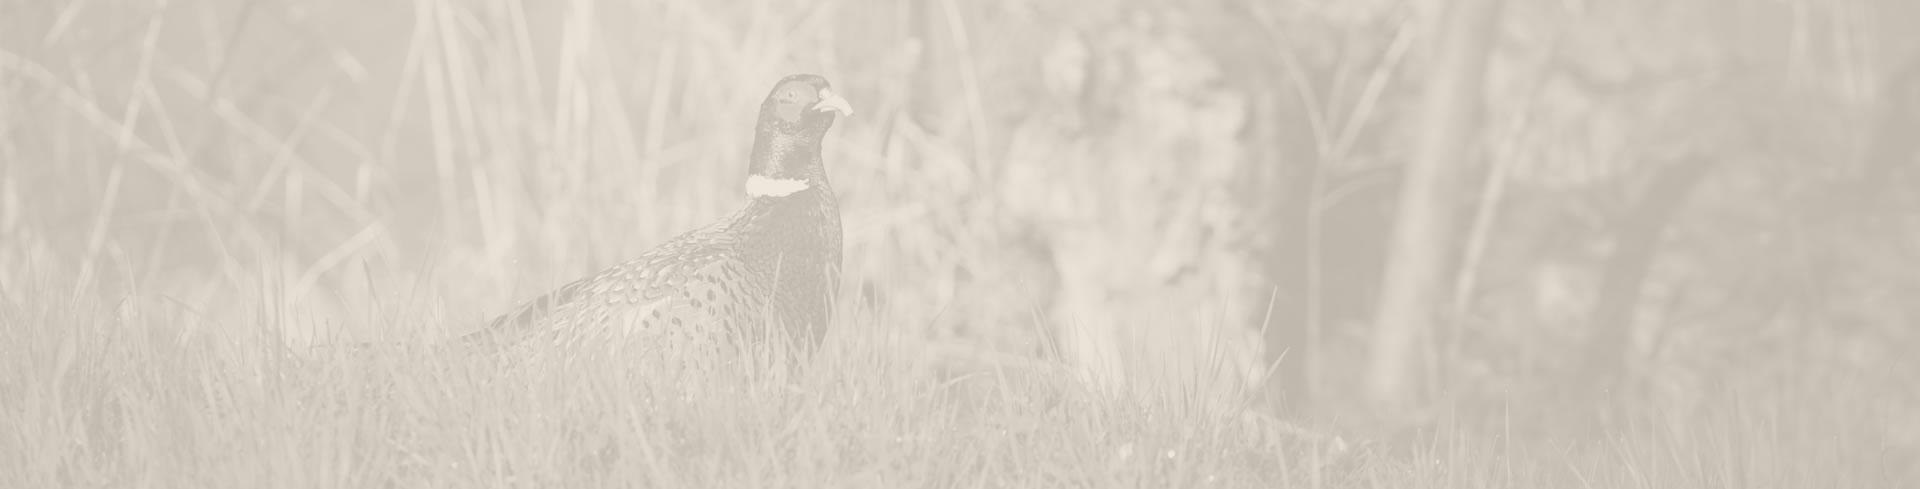 Pheasant Preserve - Dead End Pheasant Farm - Almont, MI